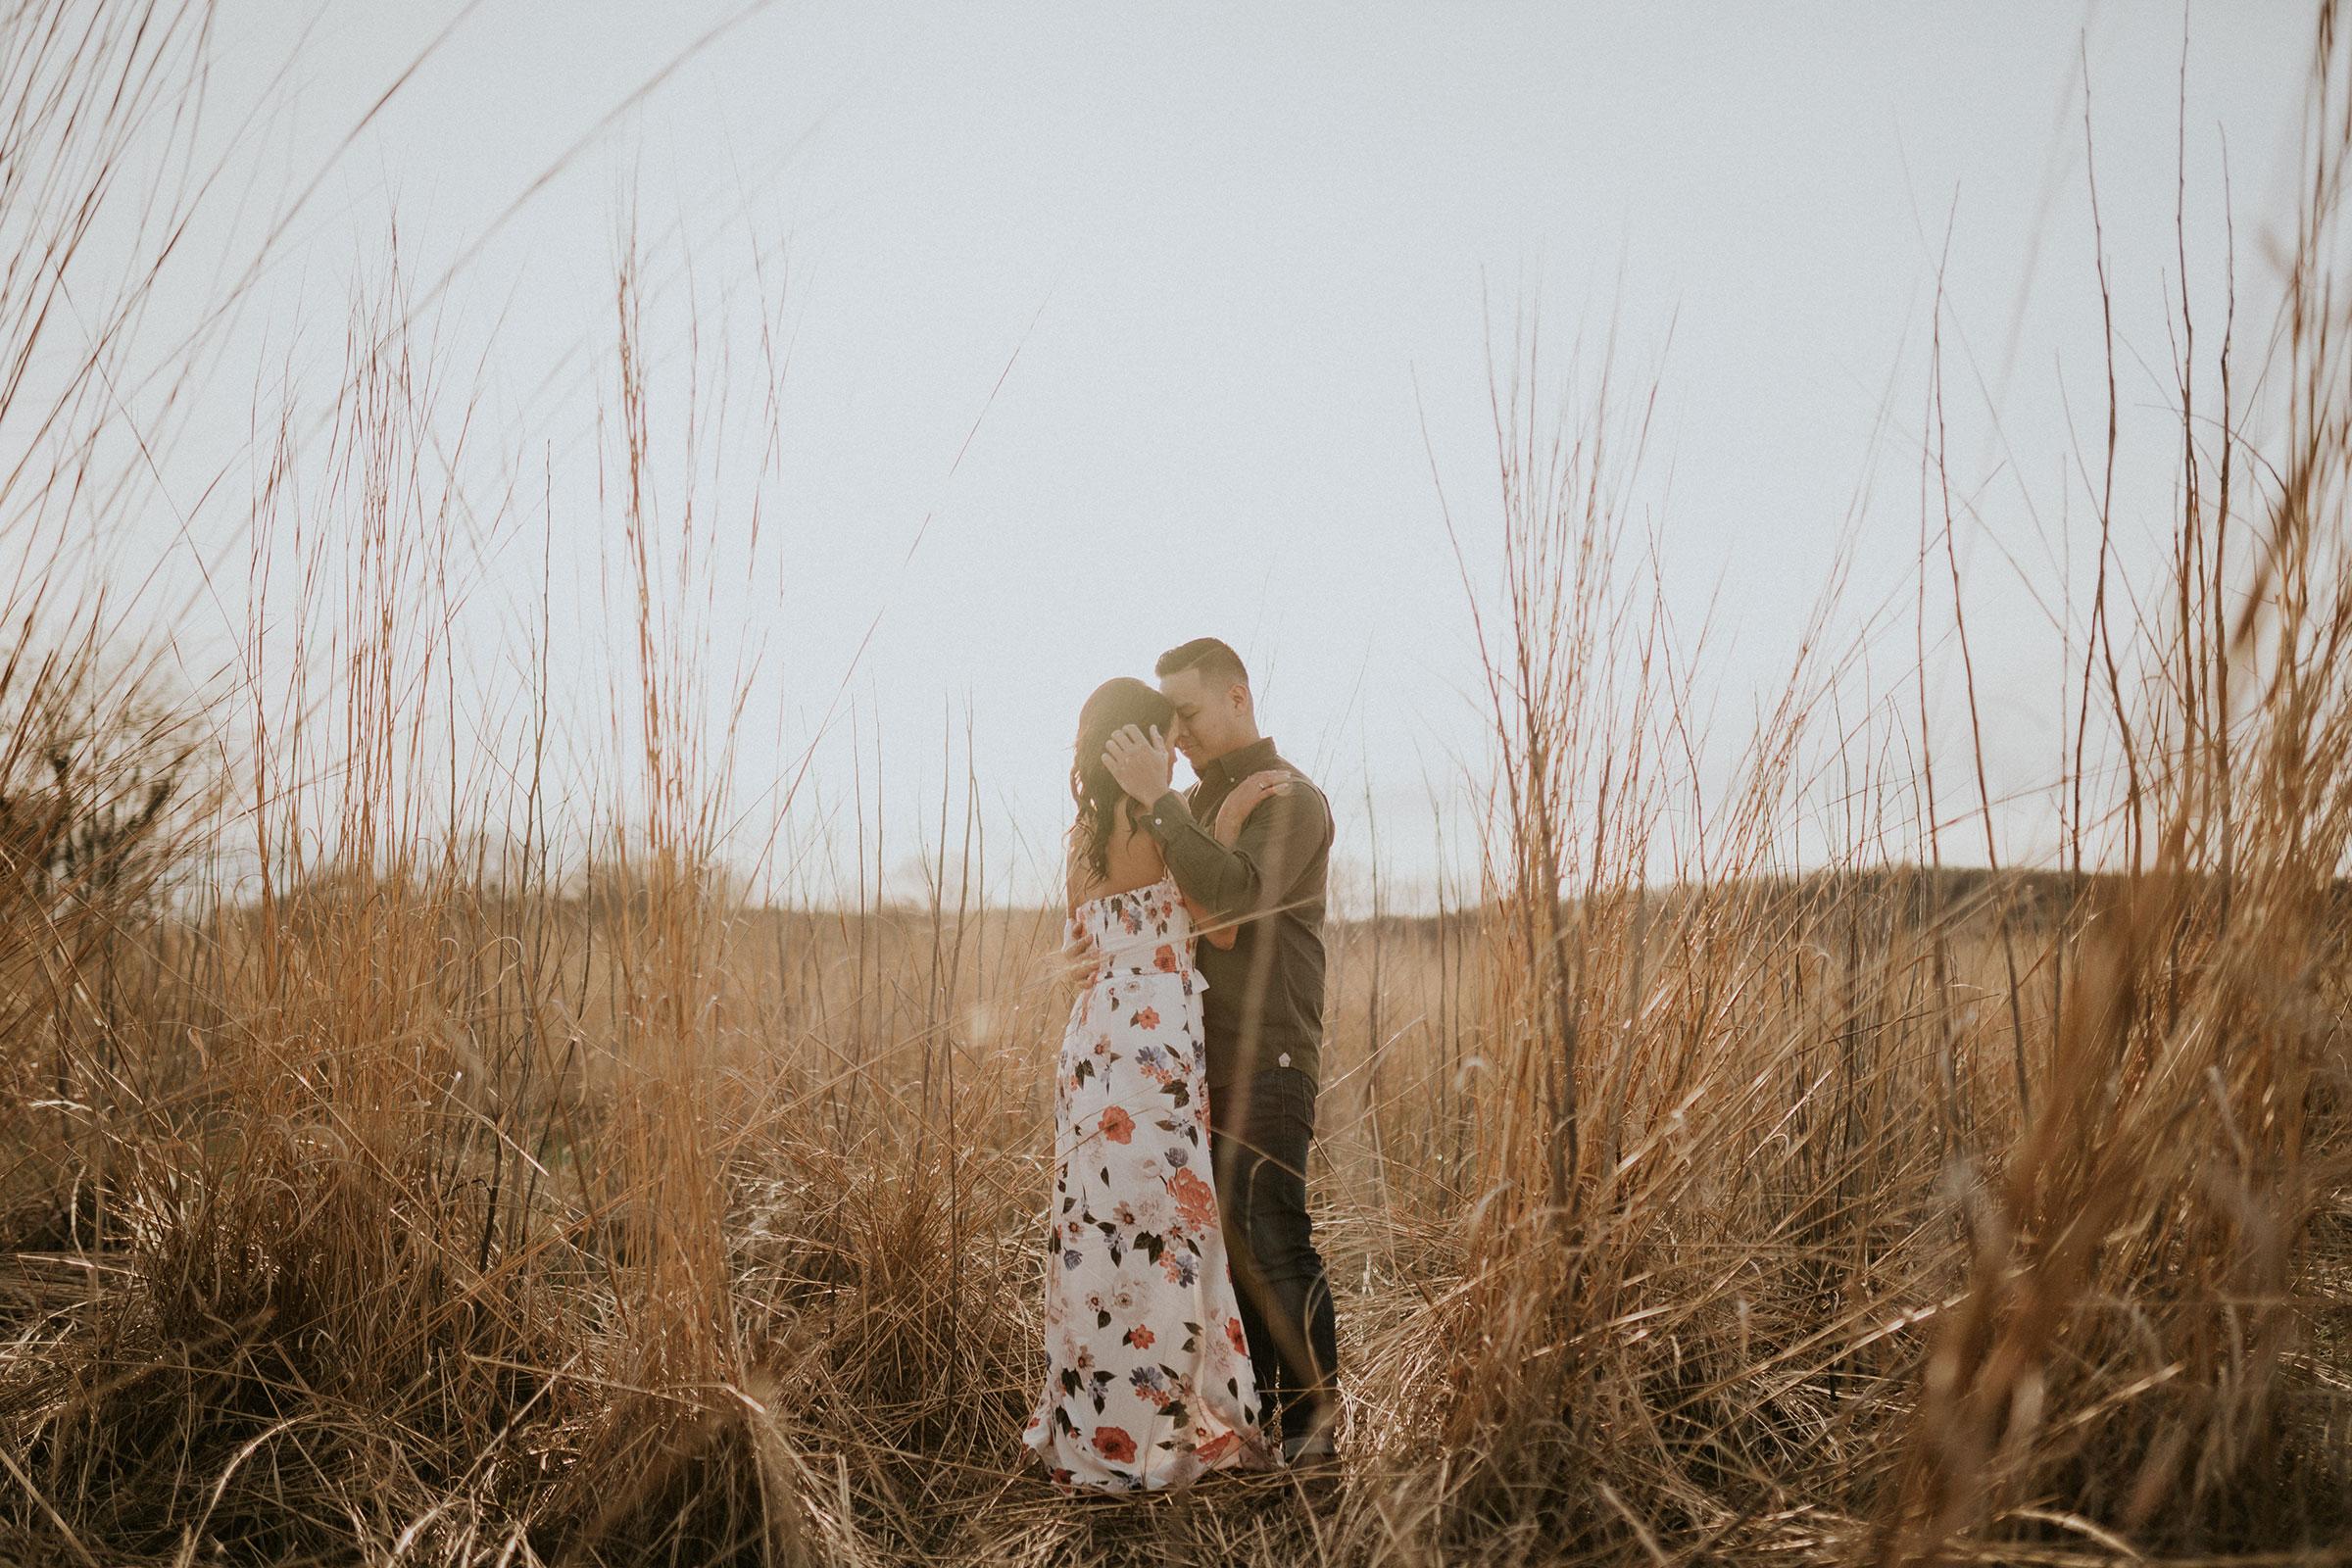 couple-holding-each-other-in-field-winterset-iowa-raelyn-ramey-photography.jpg